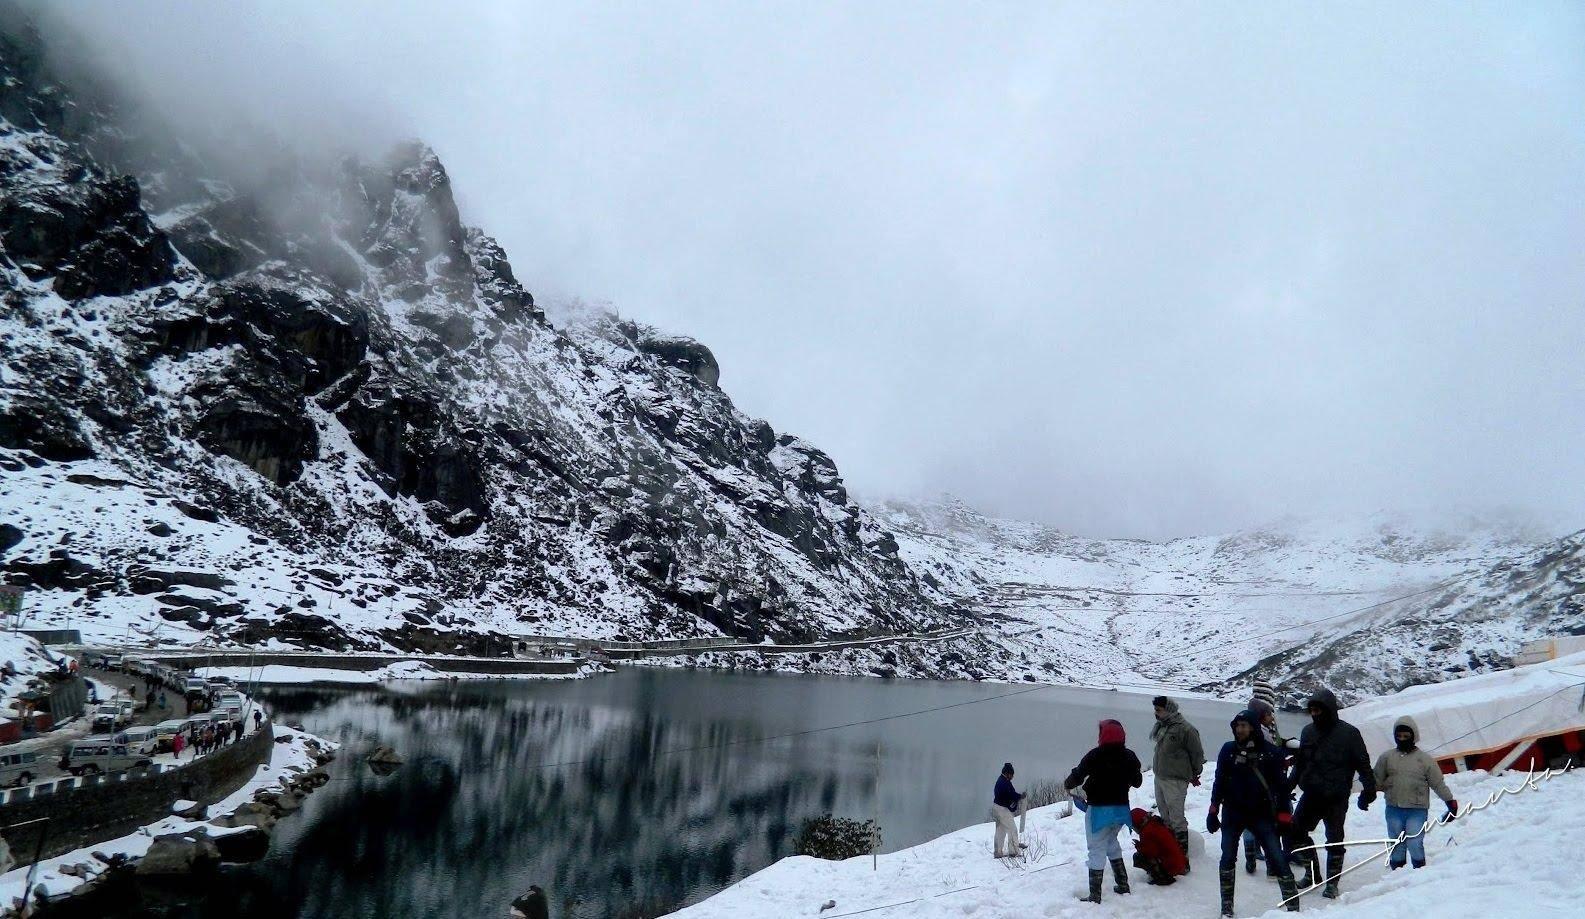 Family Tour to Darjeeling & Gangtok - With TH Adventures